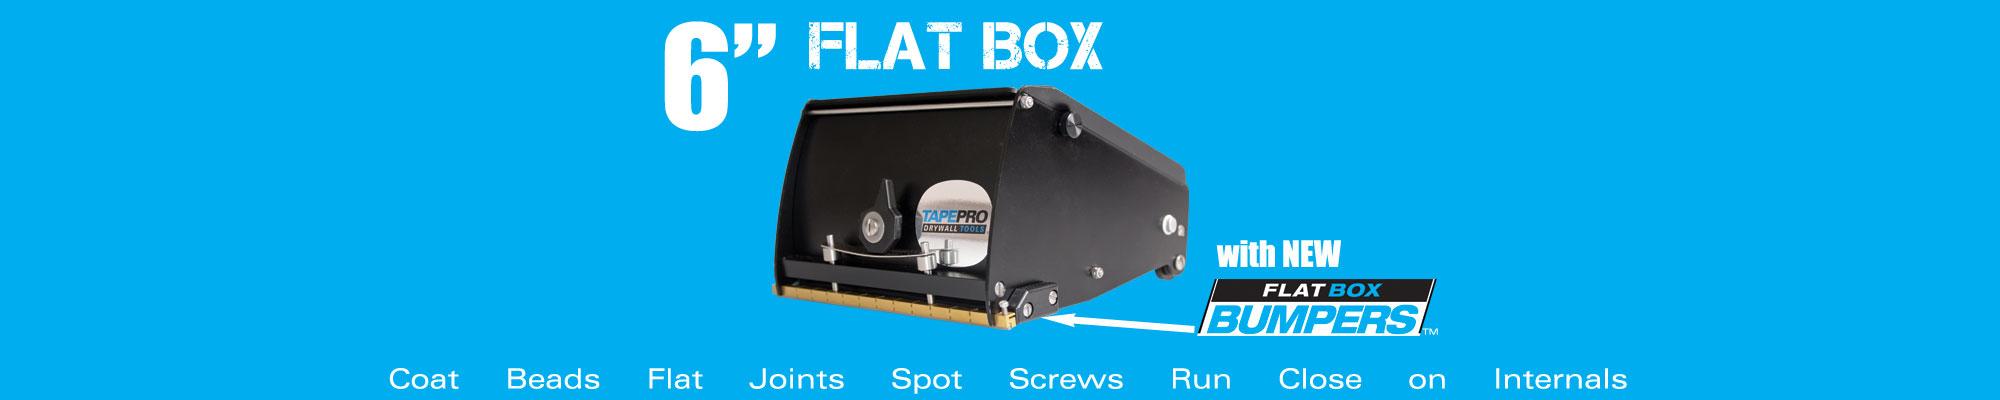 "6"" Flat Box Banner"